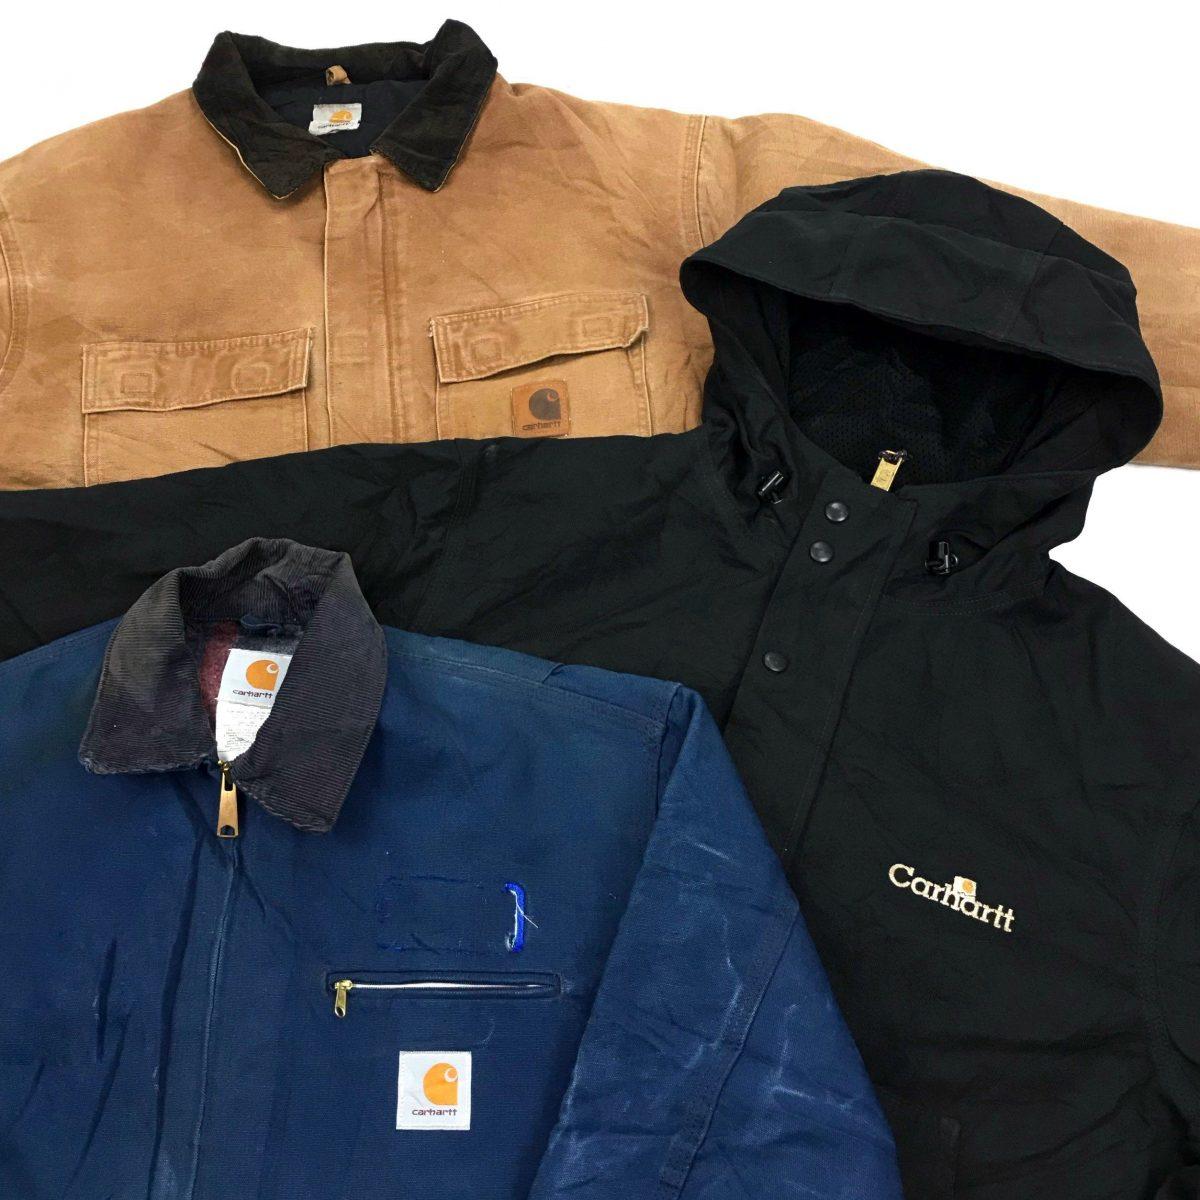 carhartt workwear jackets